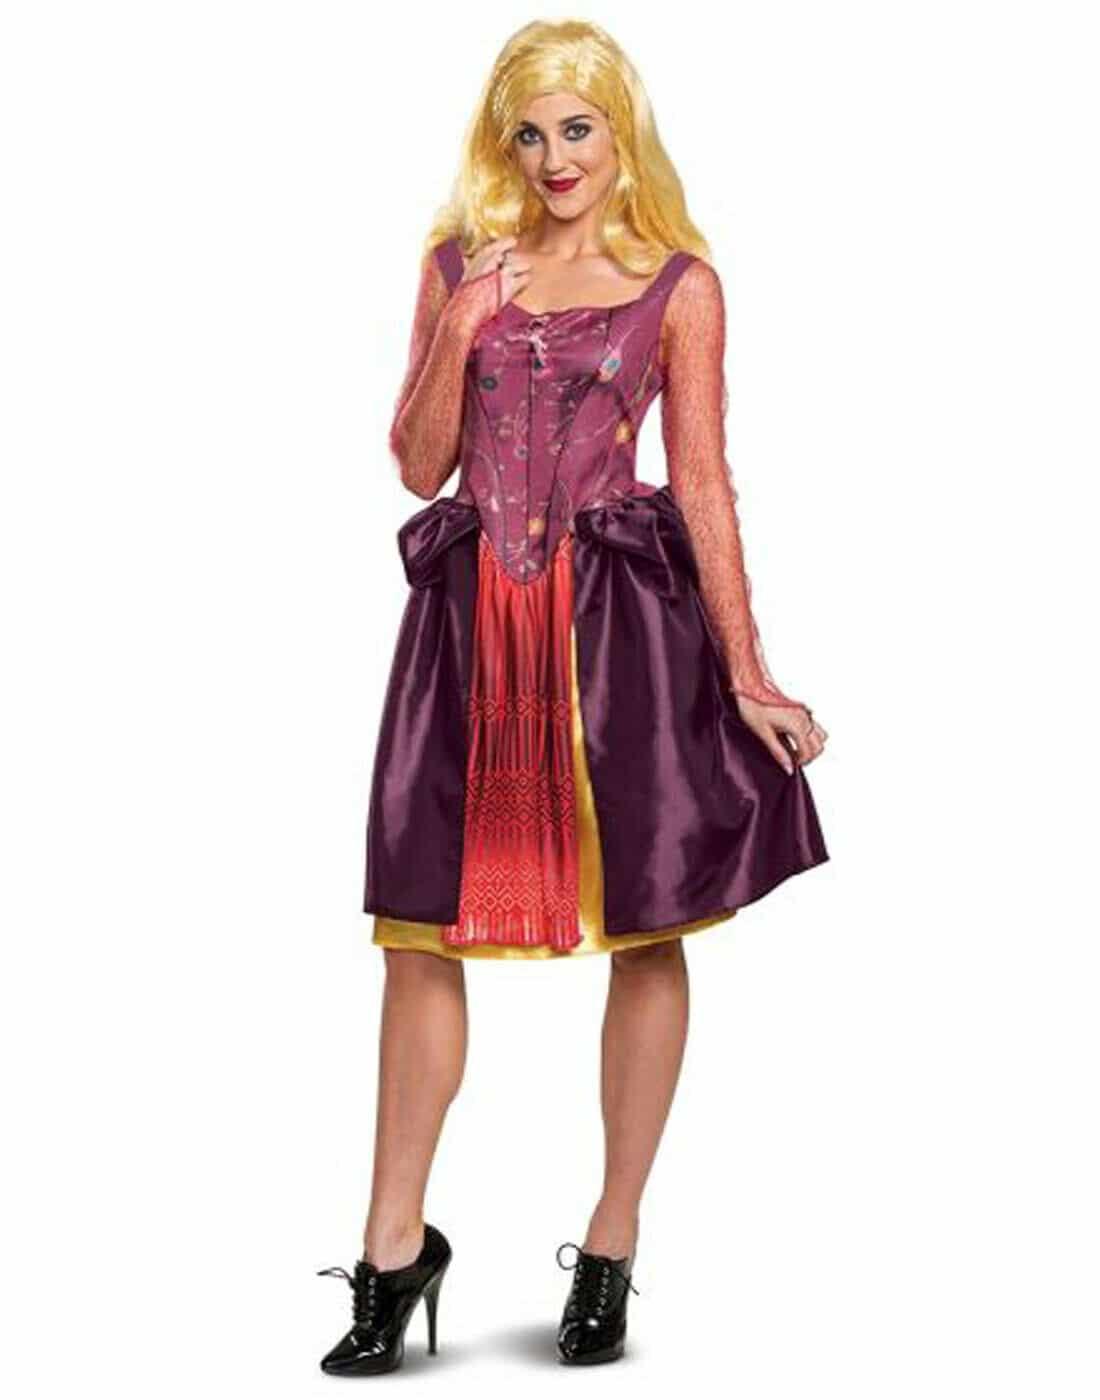 shopDisney kicks off the Halloween month with Hocus Pocus dolls 21